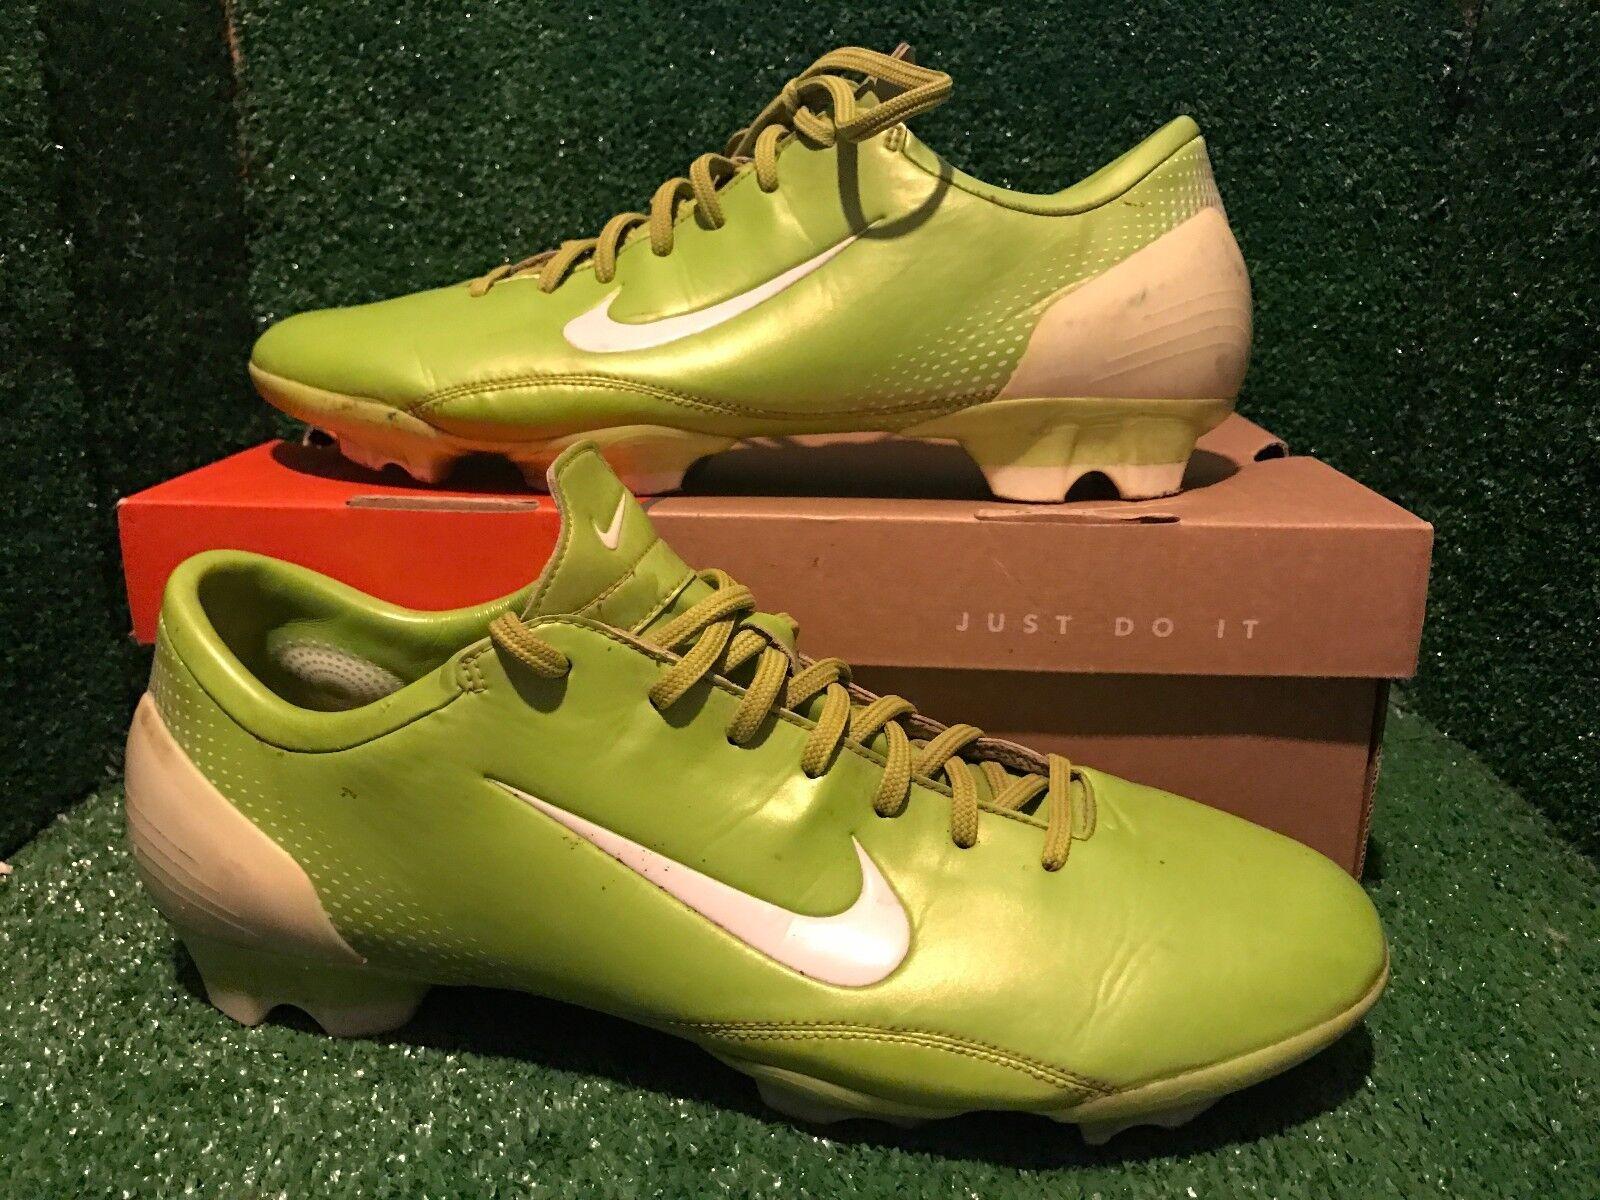 Nike Mercurial Cactus Talaria III FG talla 11 10 45 Elite